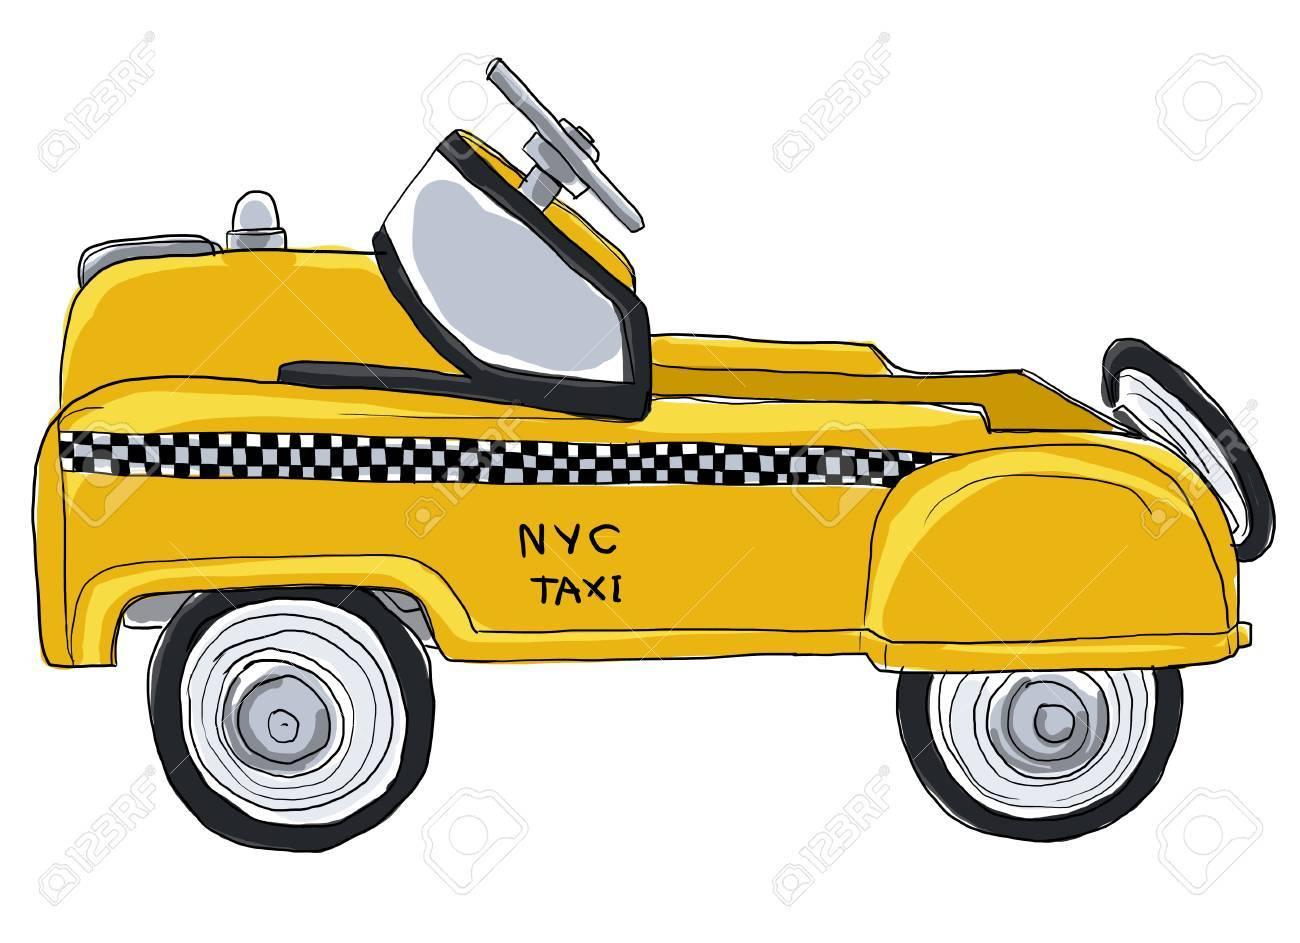 Stock Photo - Yellow taxi new york city vintage toys